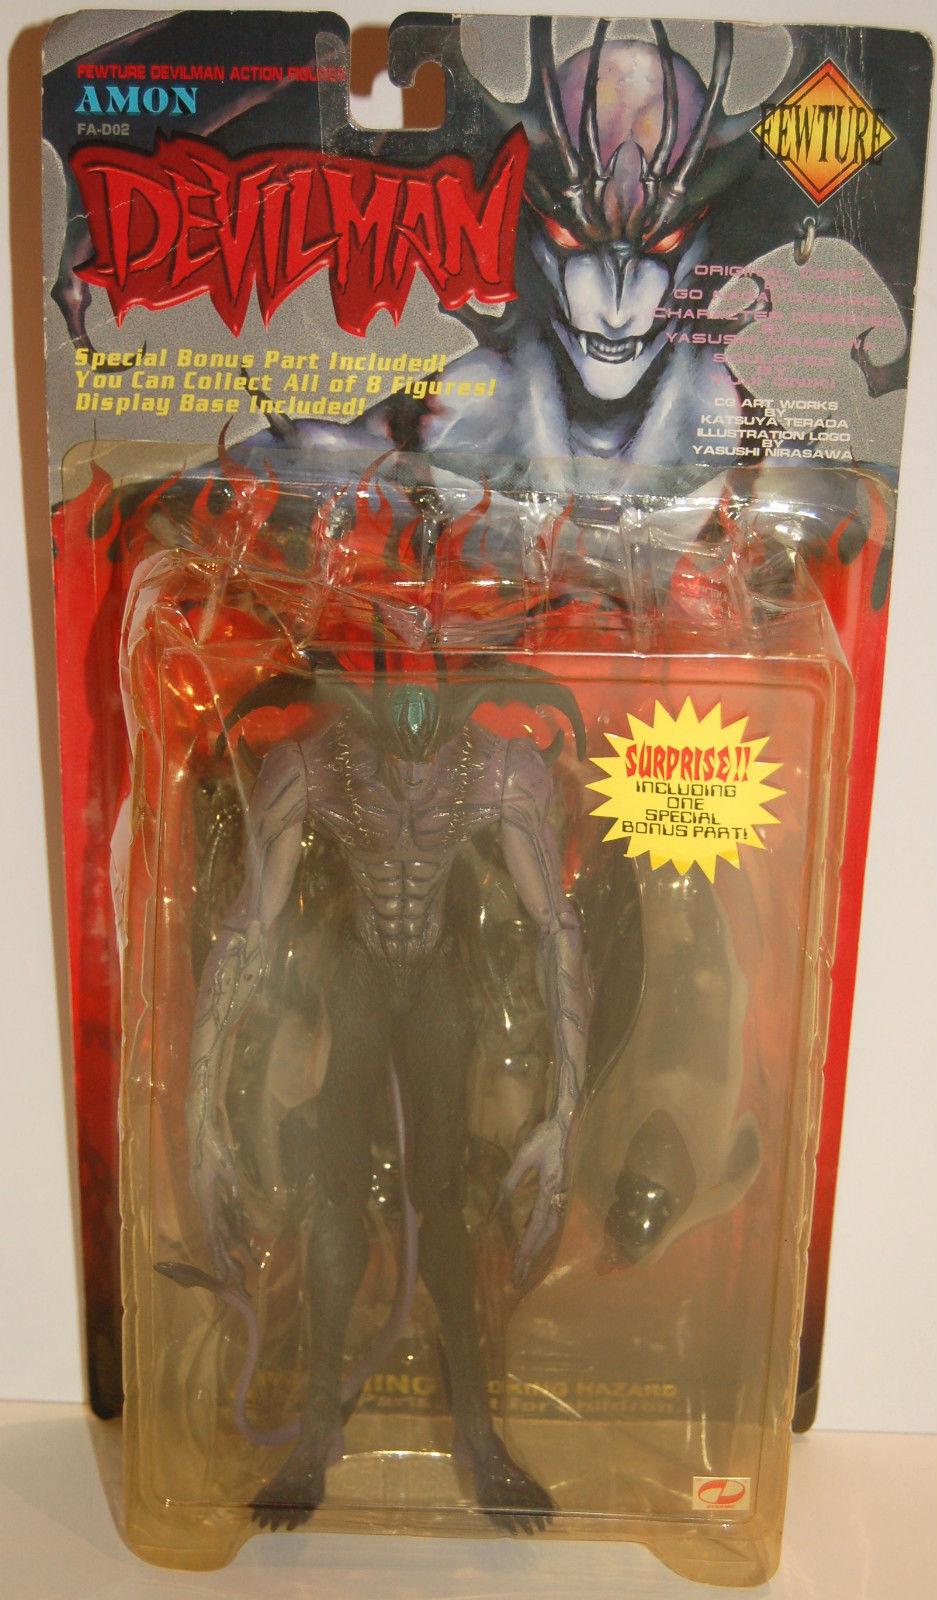 Devilman Amon 2000 Fewture Series 2 9